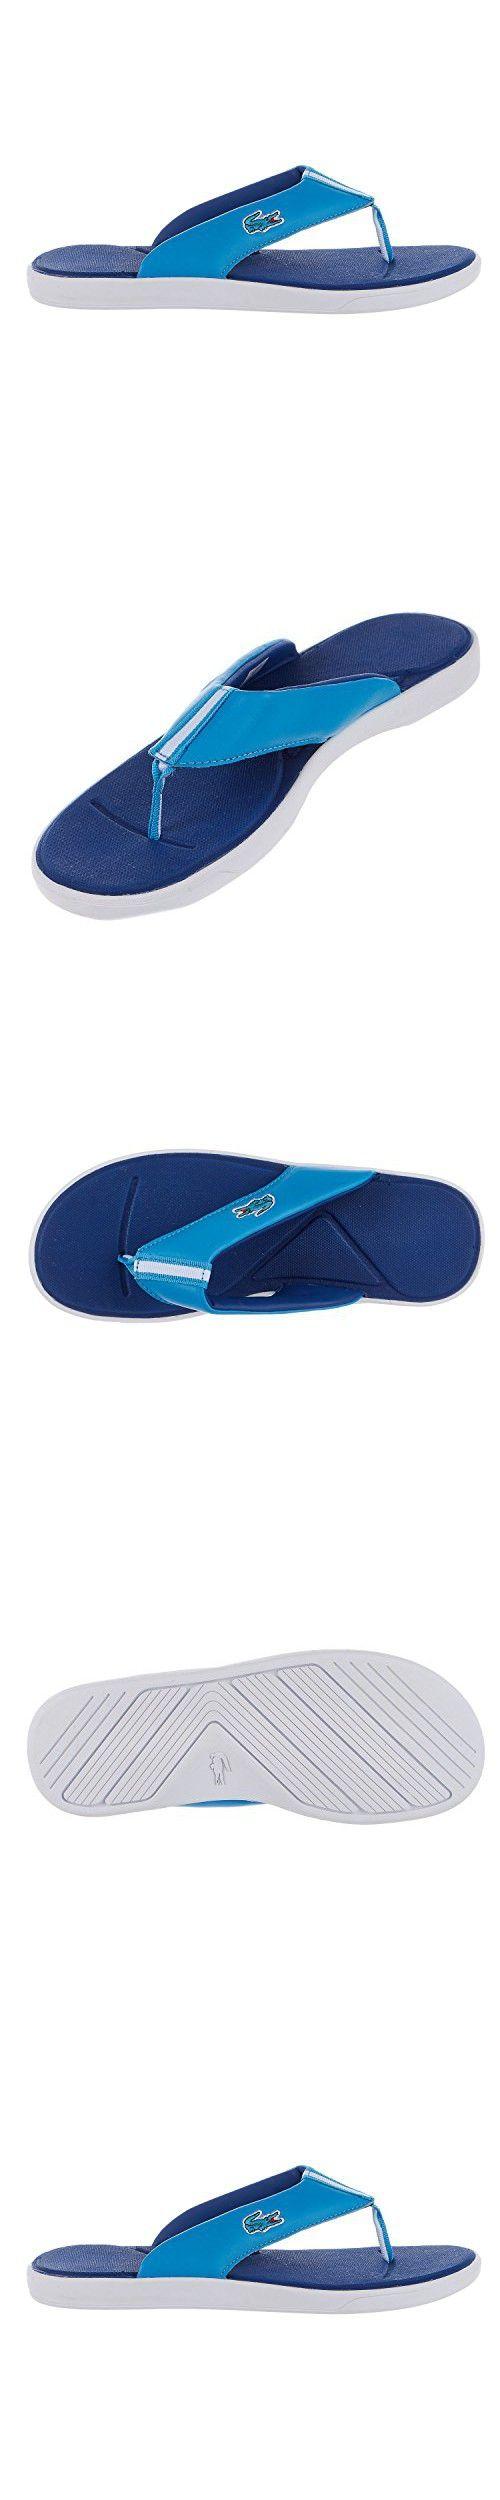 Lacoste L30 Men's Leather Flip Flops Sandals Red Size 10